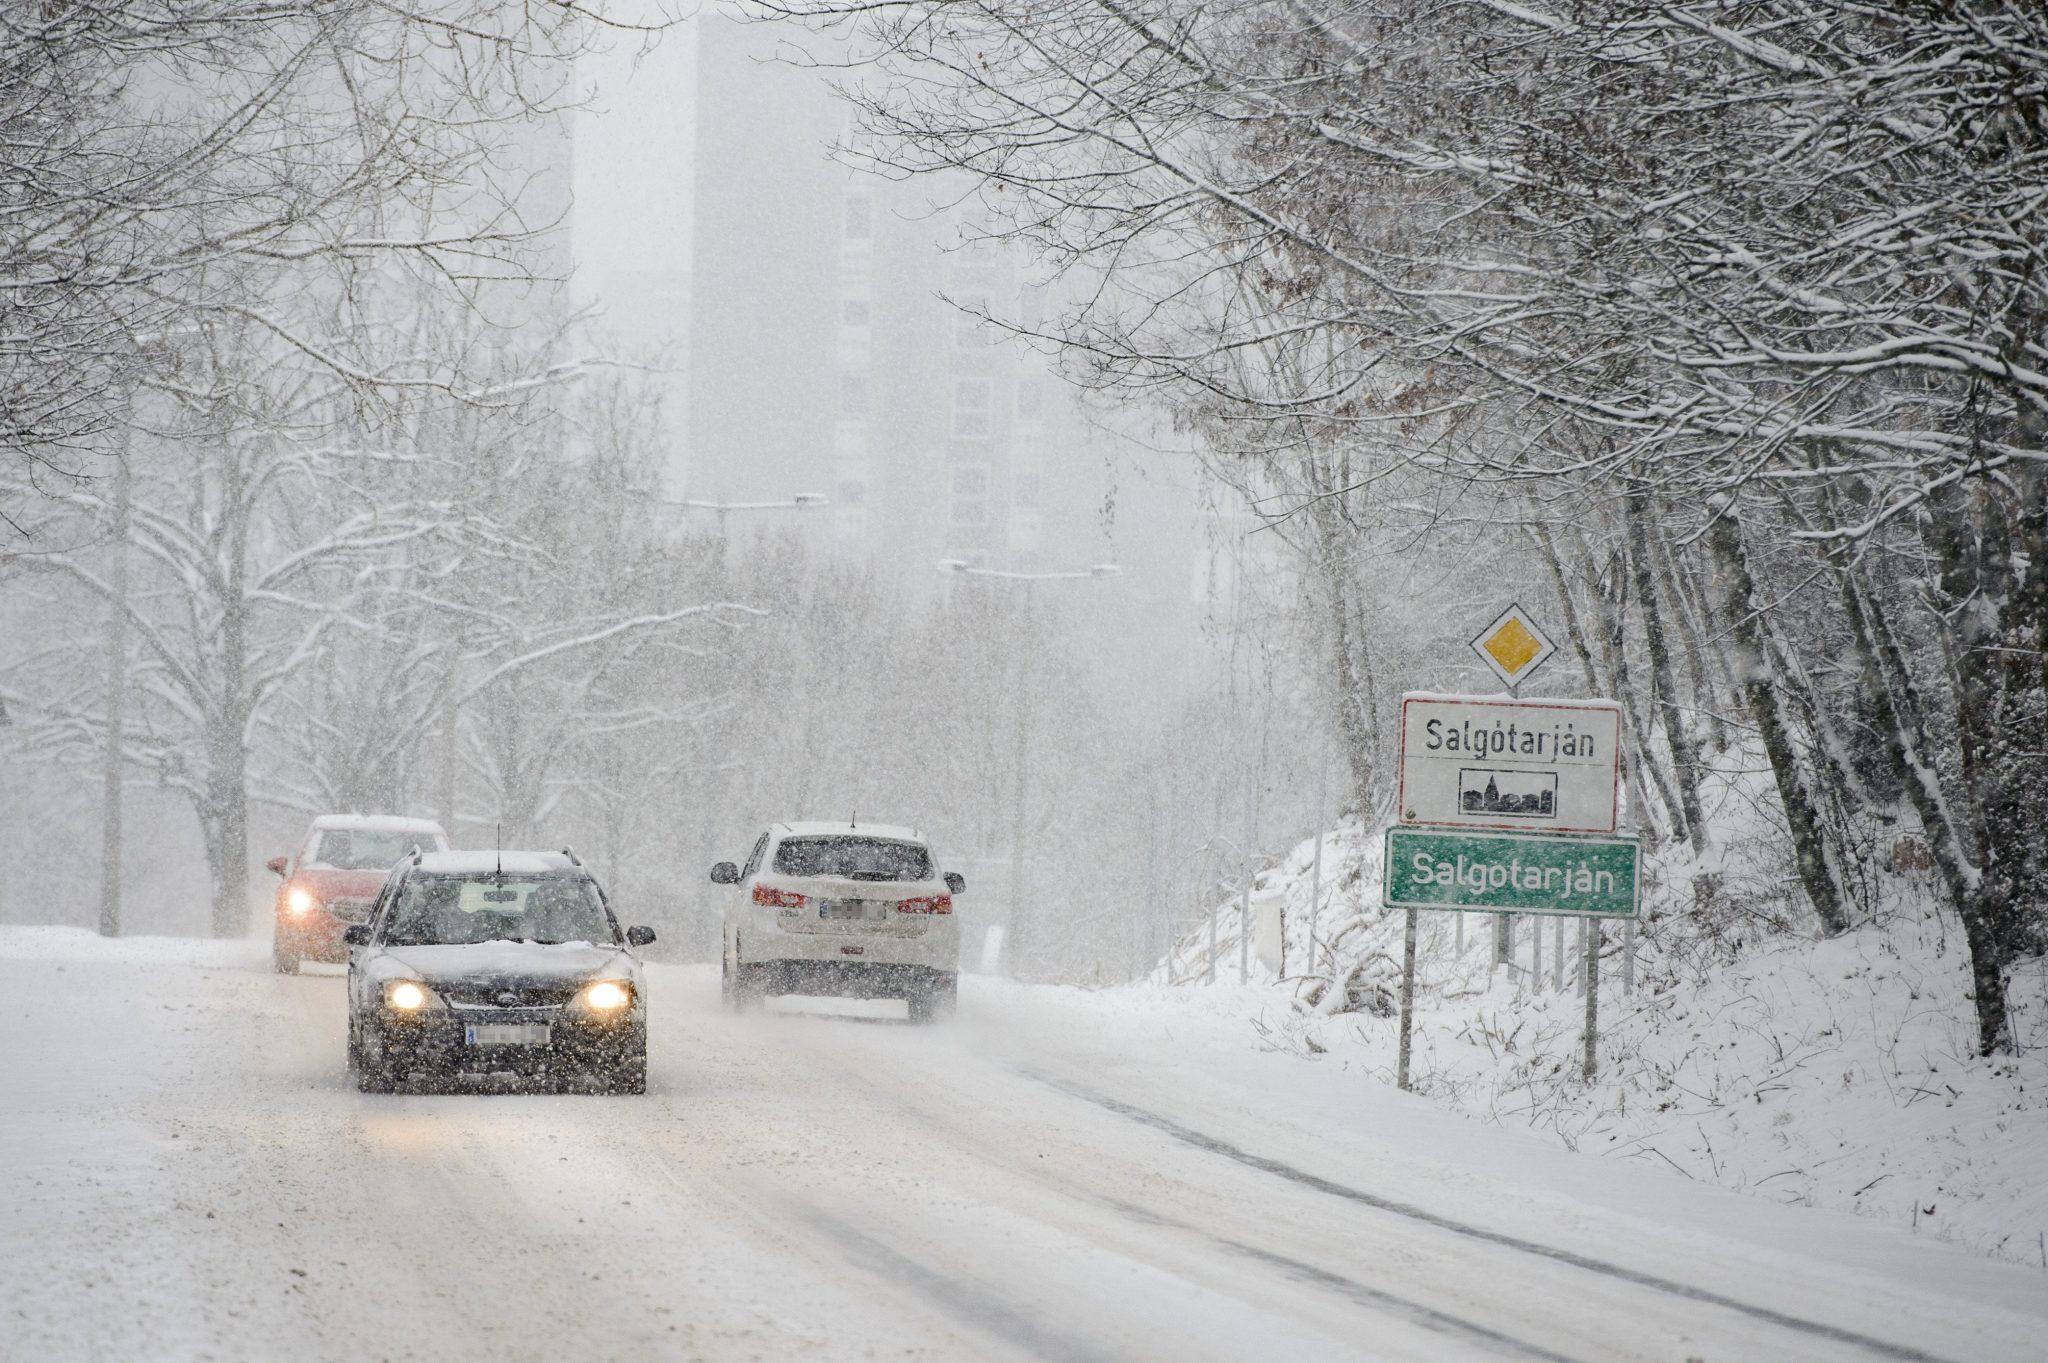 snow Hungary car traffic